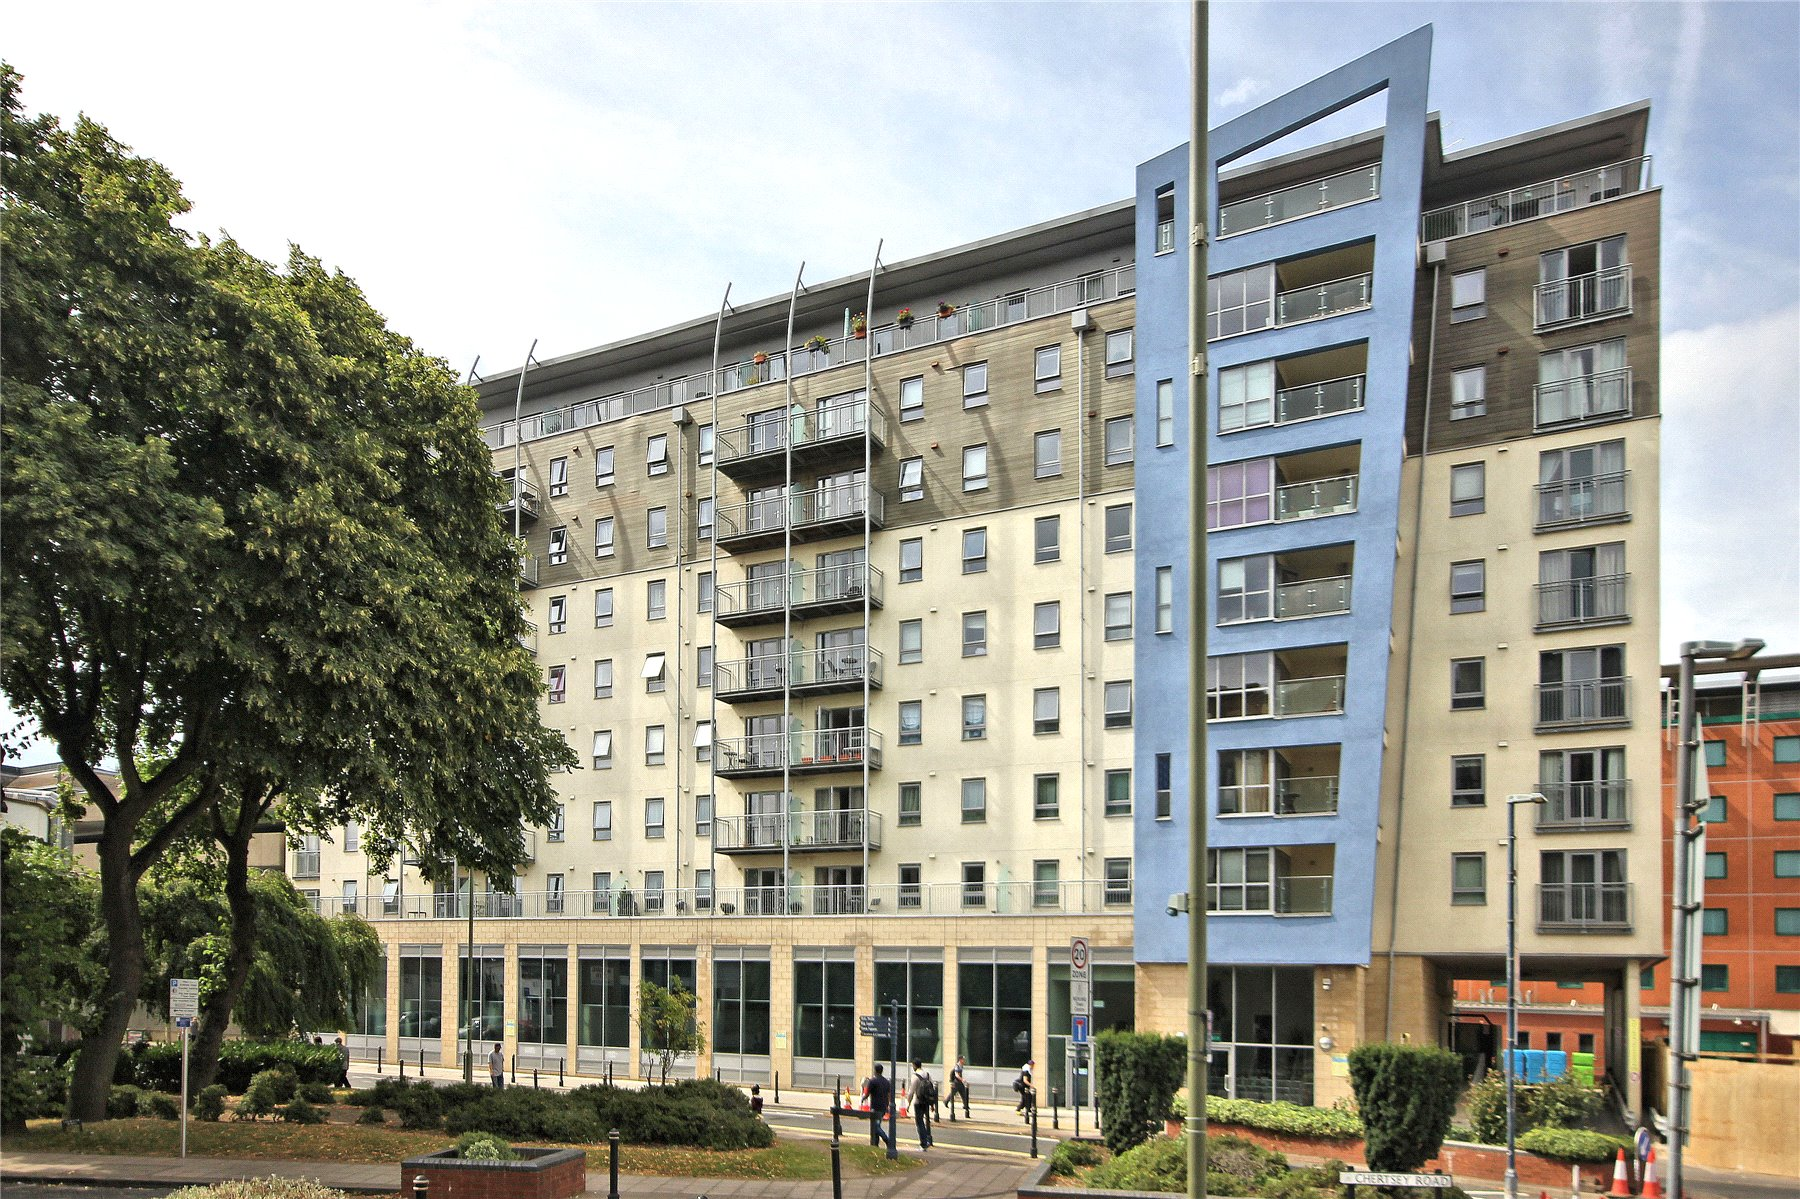 2 Bedrooms Apartment Flat for sale in Enterprise Place, 175 Church Street East, Woking, Surrey, GU21